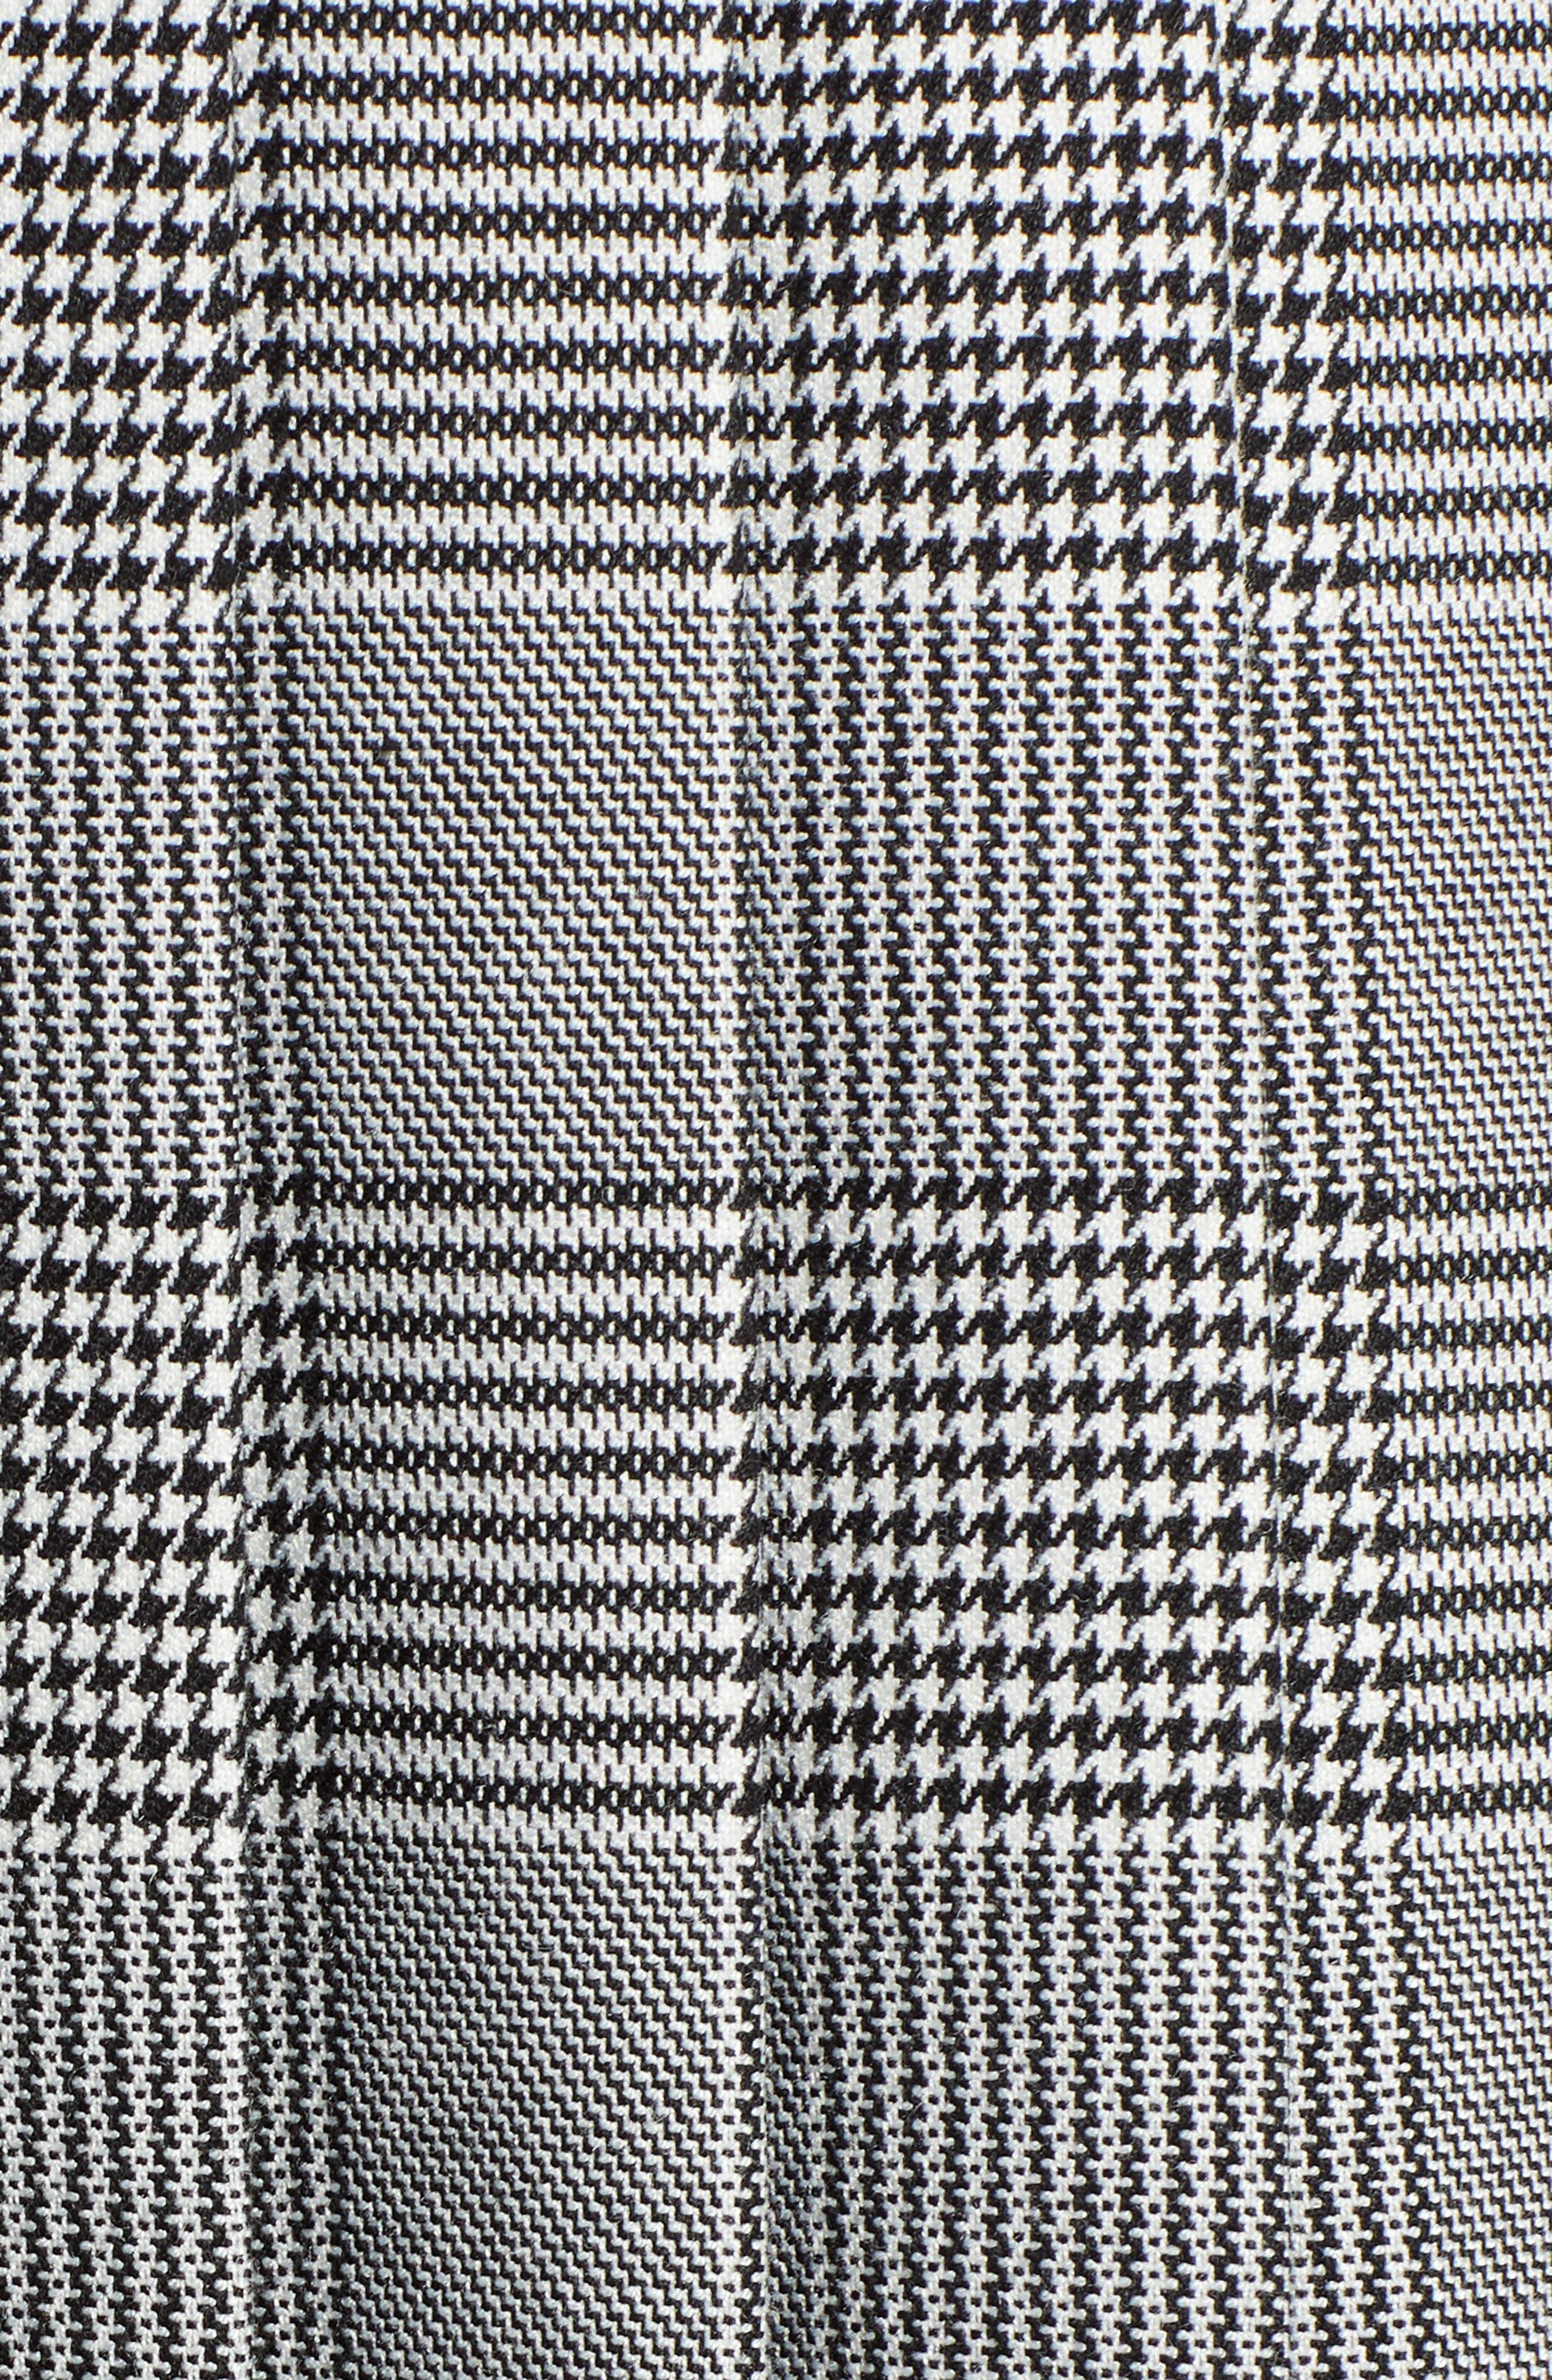 Plaid A-Line Skirt,                             Alternate thumbnail 5, color,                             001